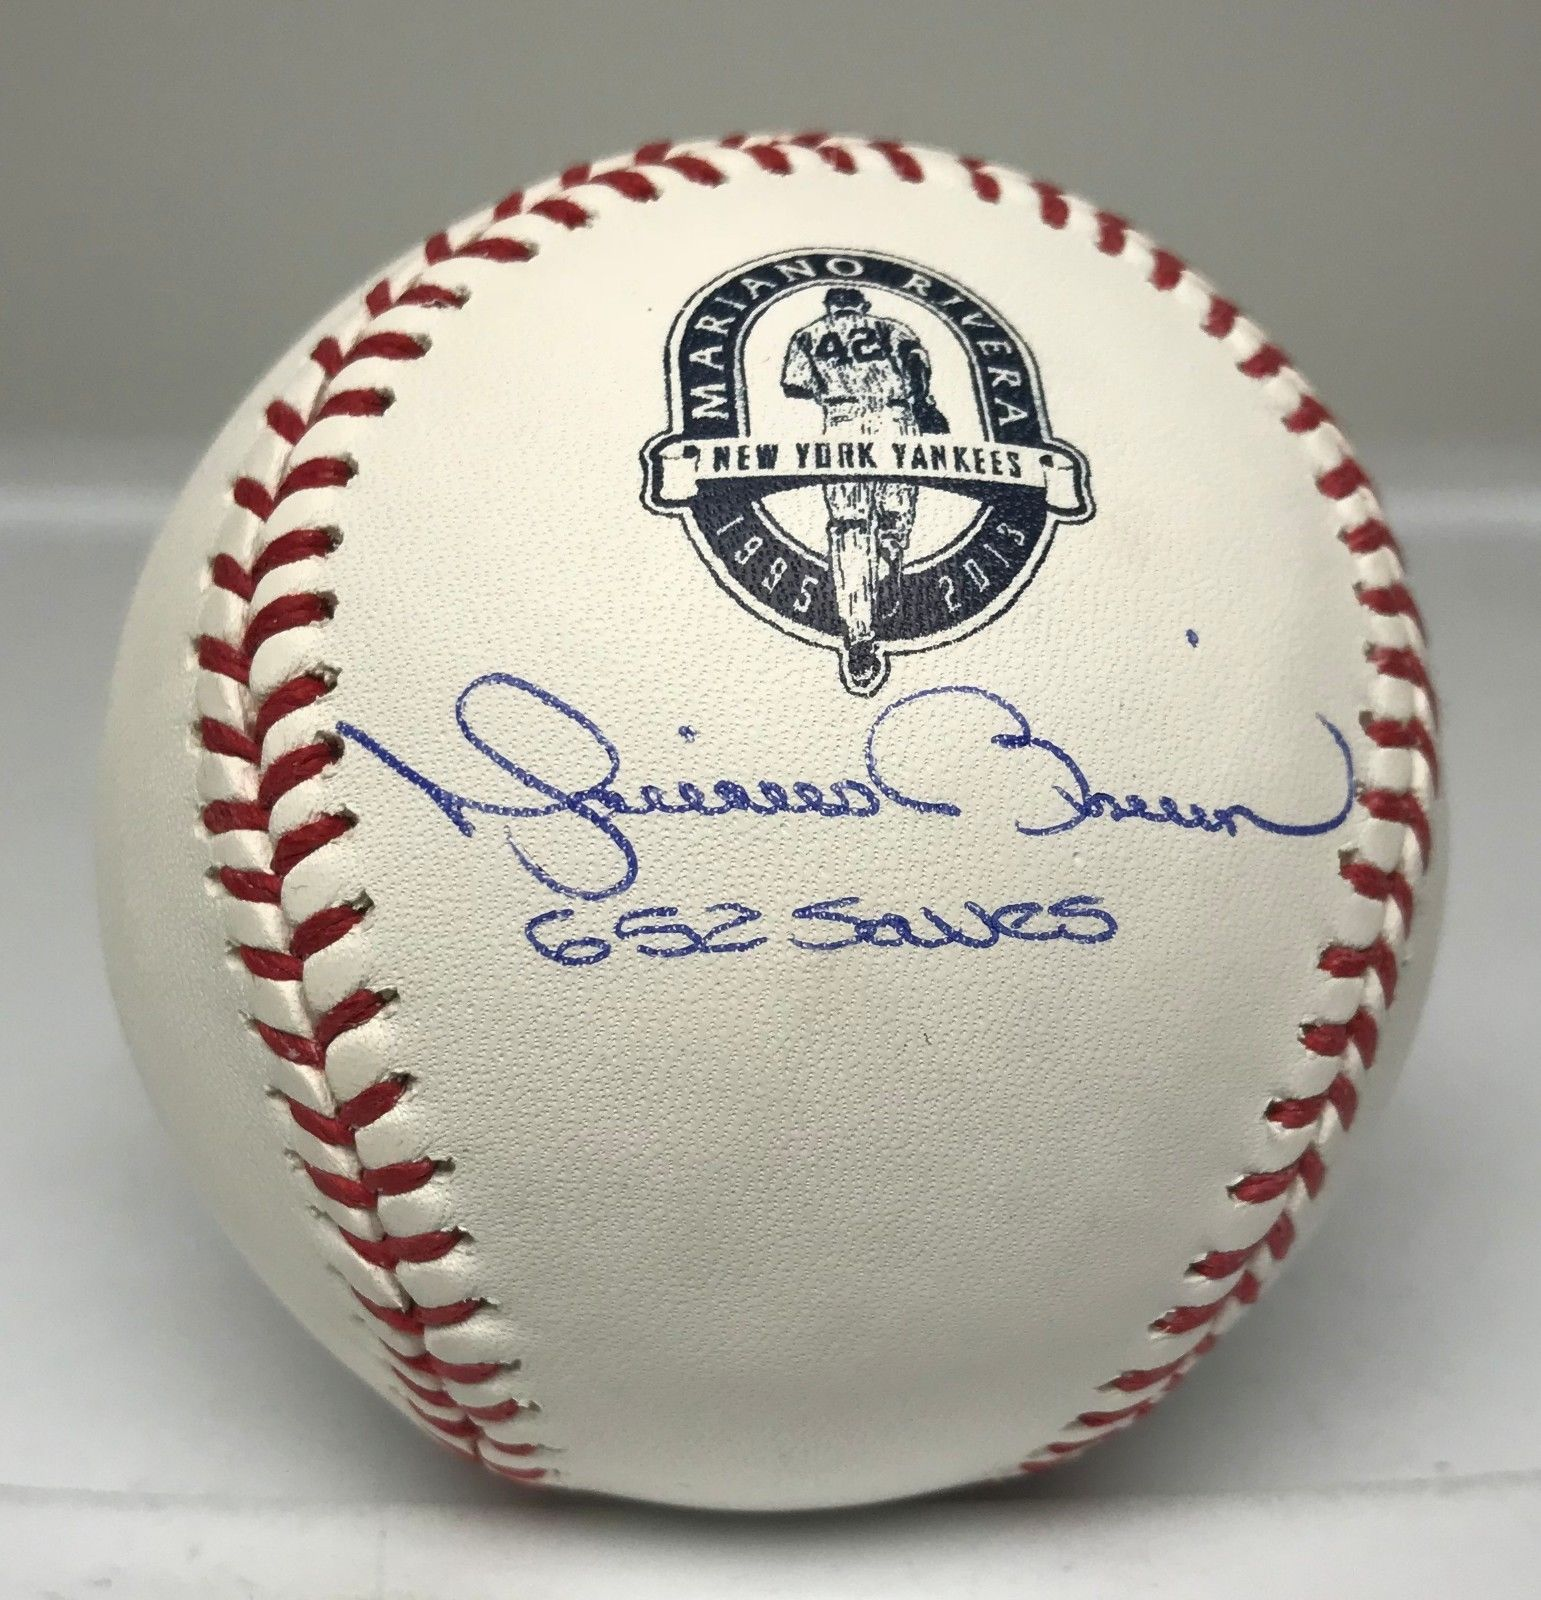 Mariano Rivera 652 Saves Signed Baseball Autograph Steiner Coa Ny Yankees Baseball Autographed Baseballs Yankees Baseball Memorabilia